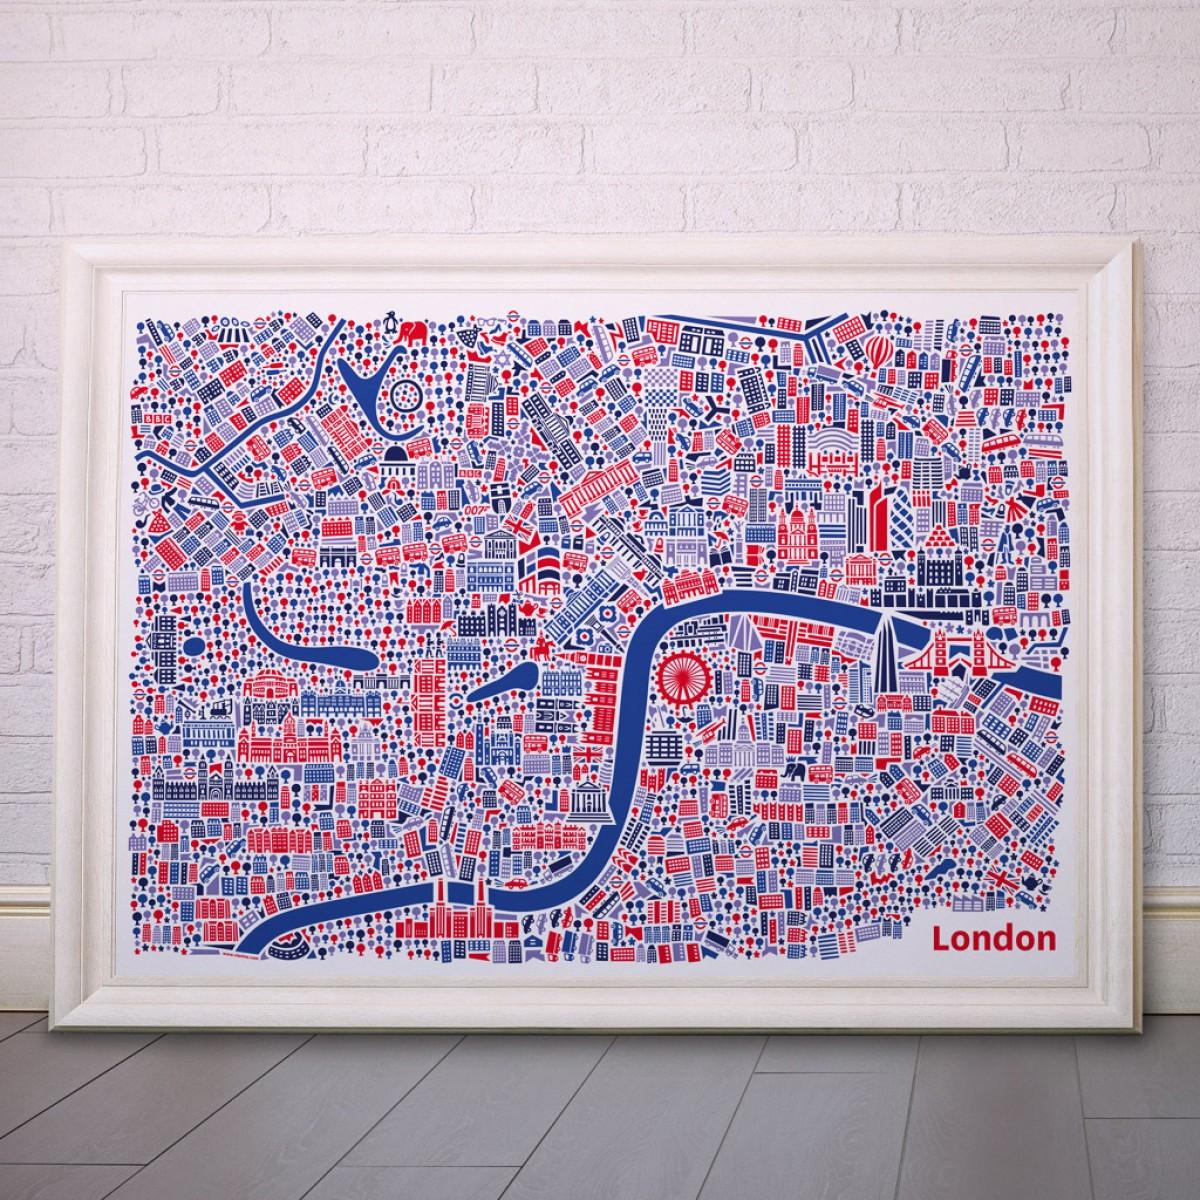 Vianina London Poster 100 x 70